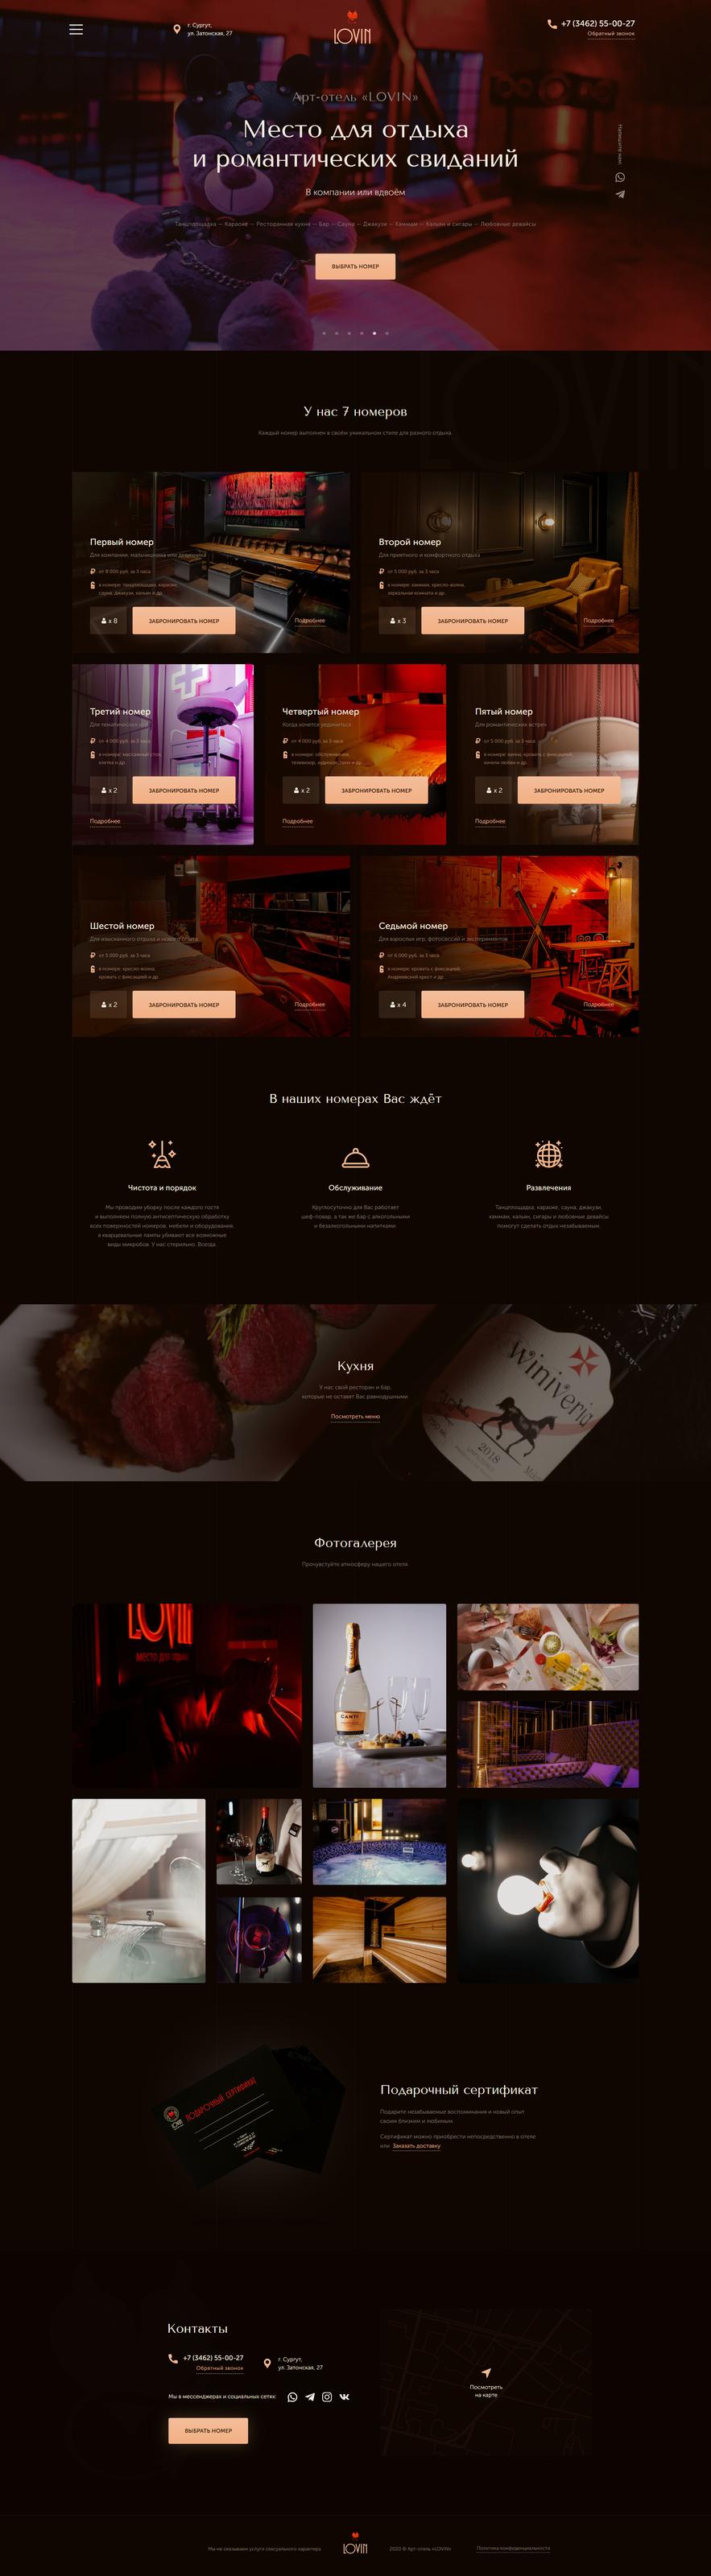 "Вёрстка дизайн-макета сайта арт-отеля ""LOVIN"""